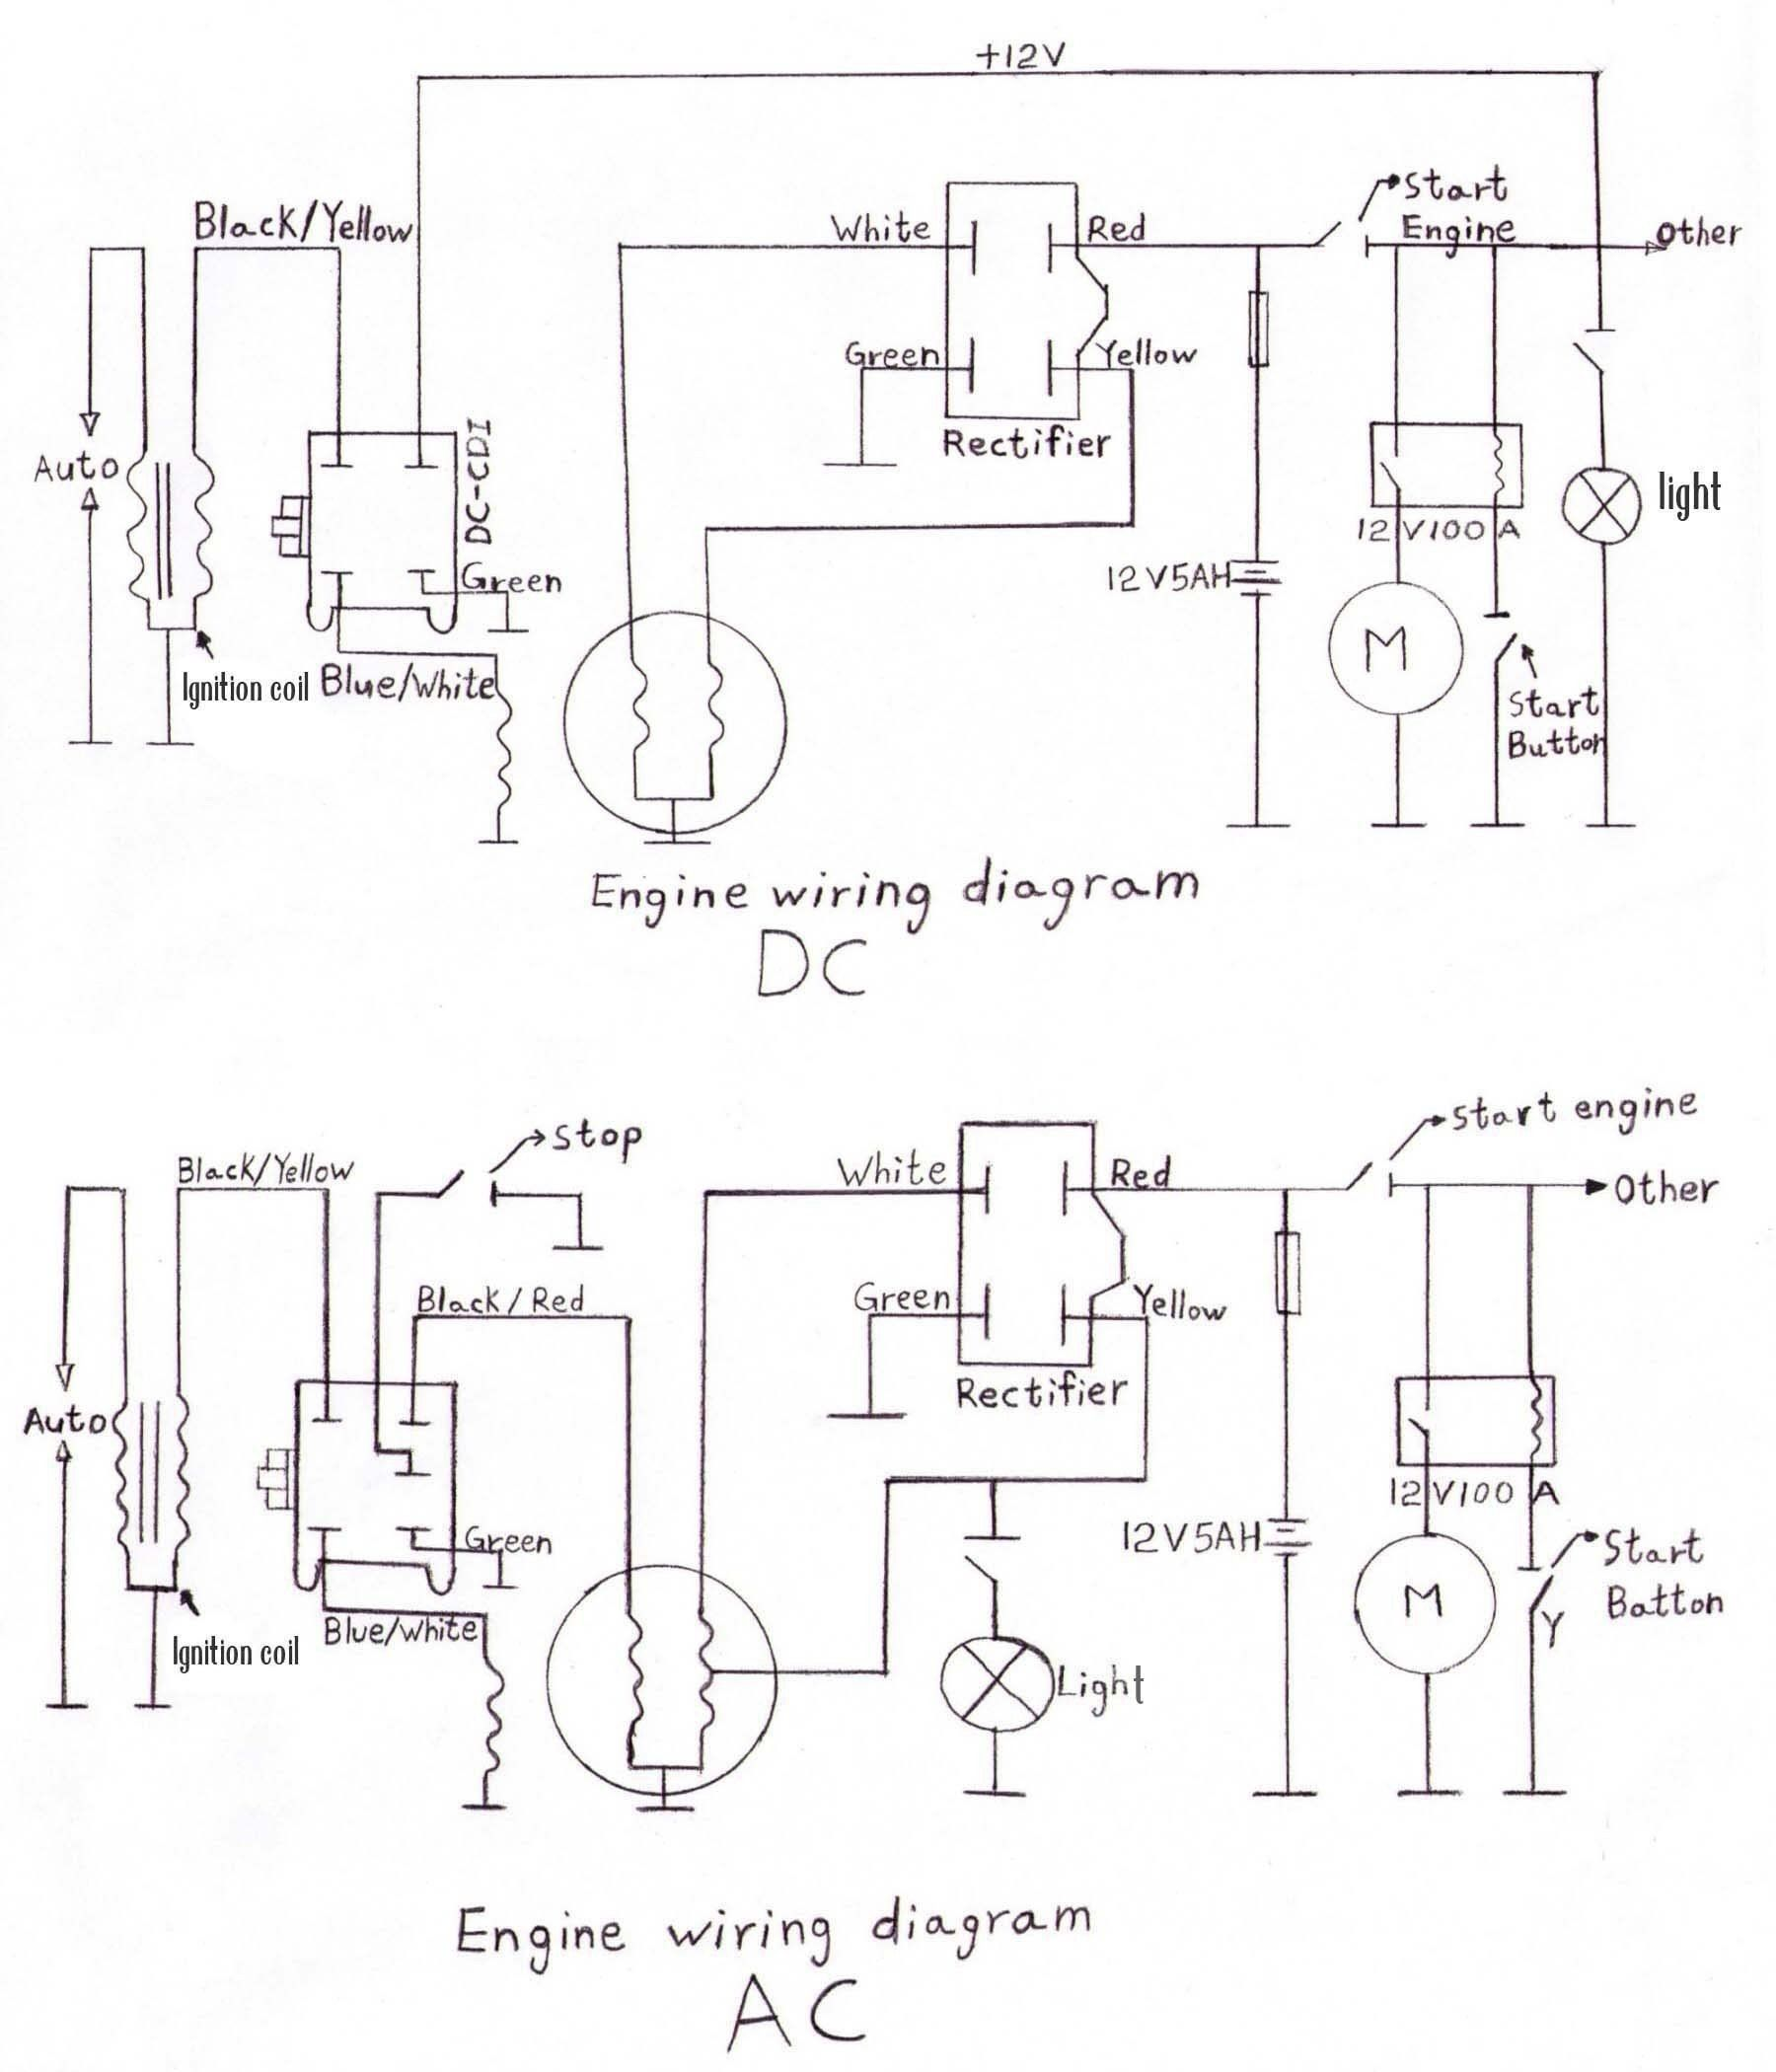 Lifan Generator Wiring Diagram